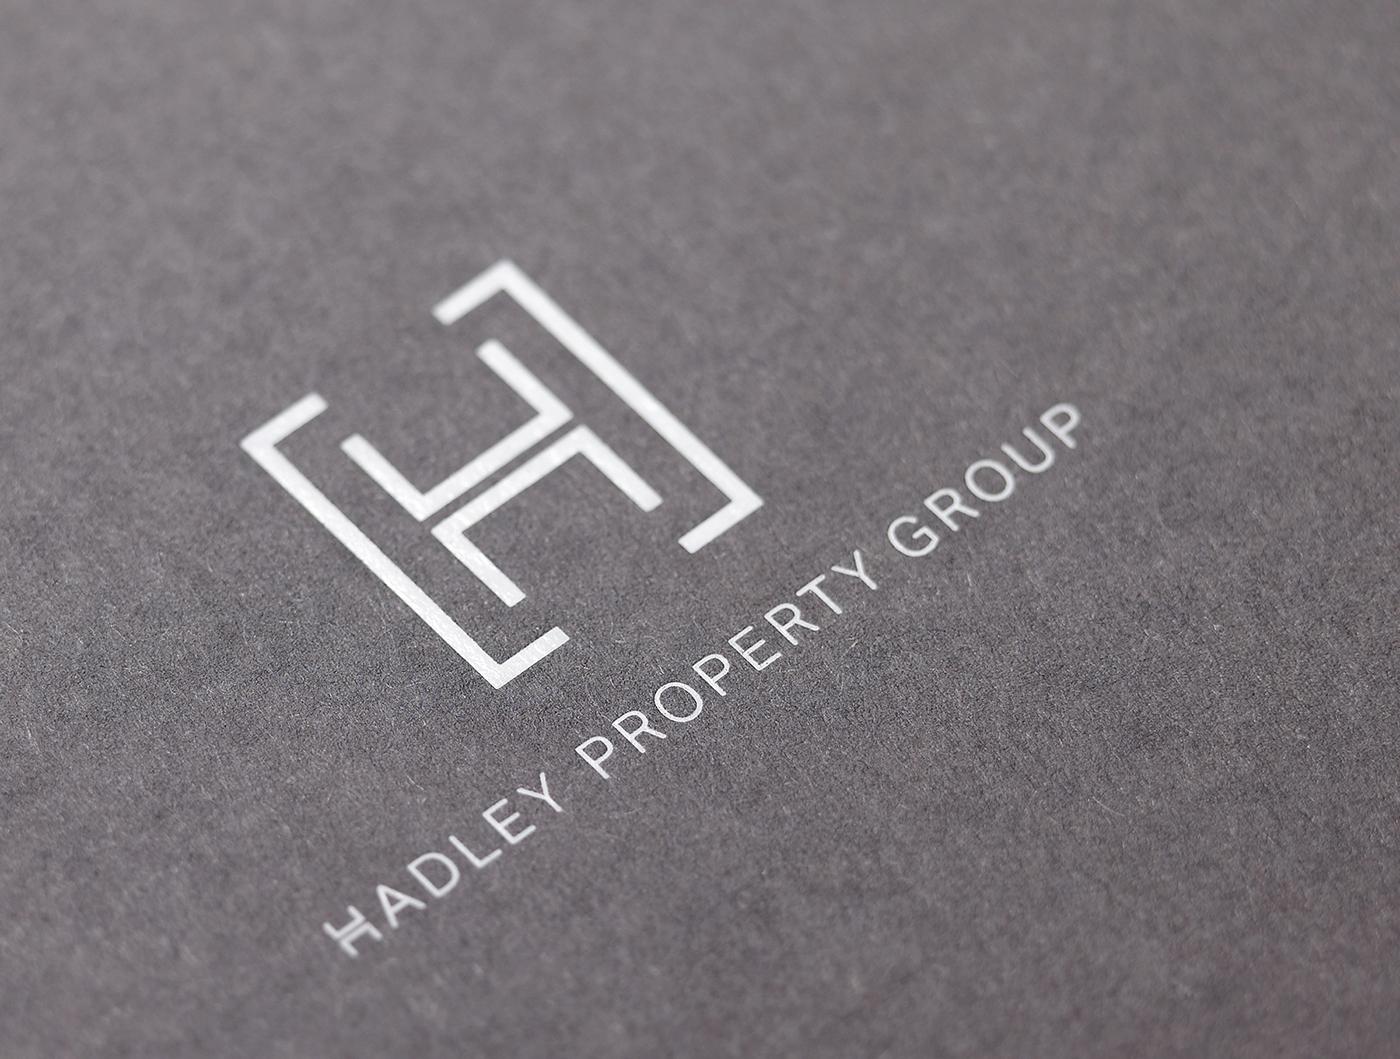 Hadley Rebrand Stationery 06 One Darnley Road